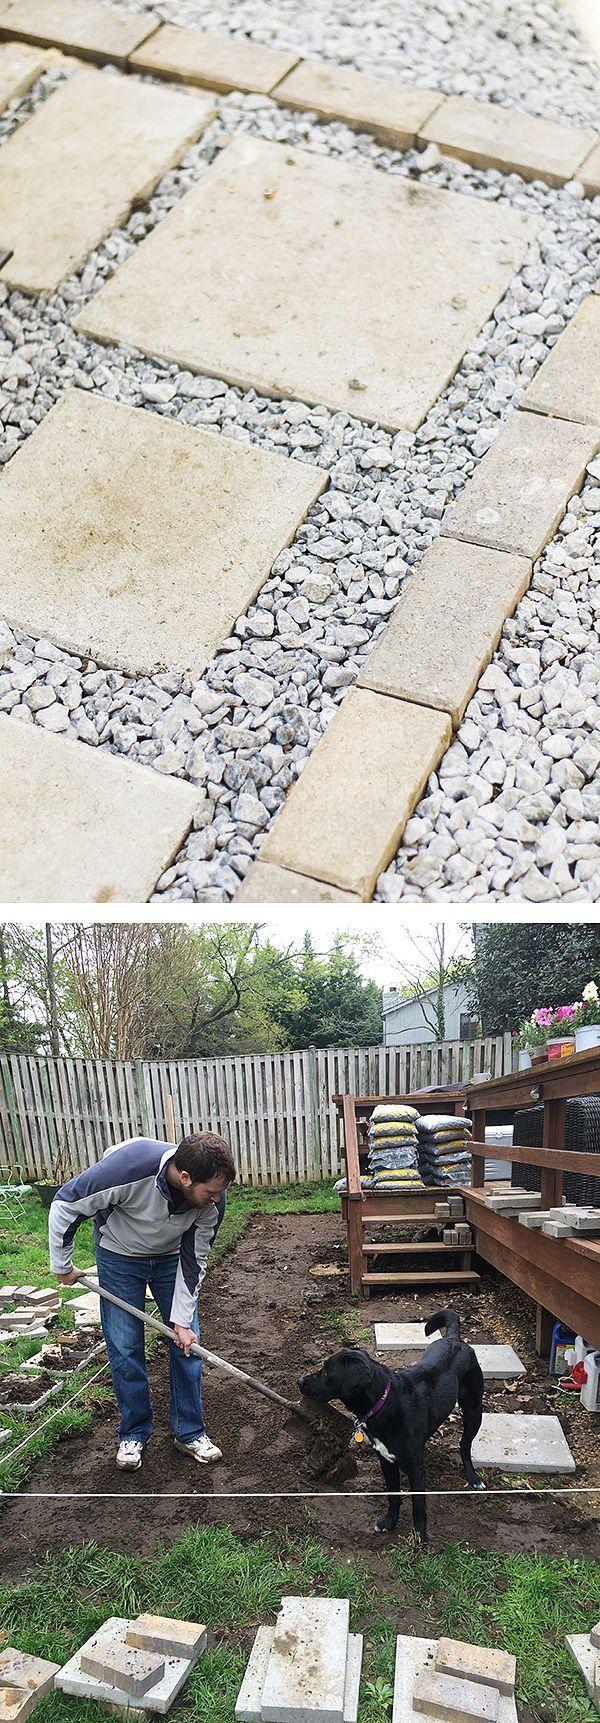 Build A Paver Patio For A Backyard Upgrade   The Home Depot